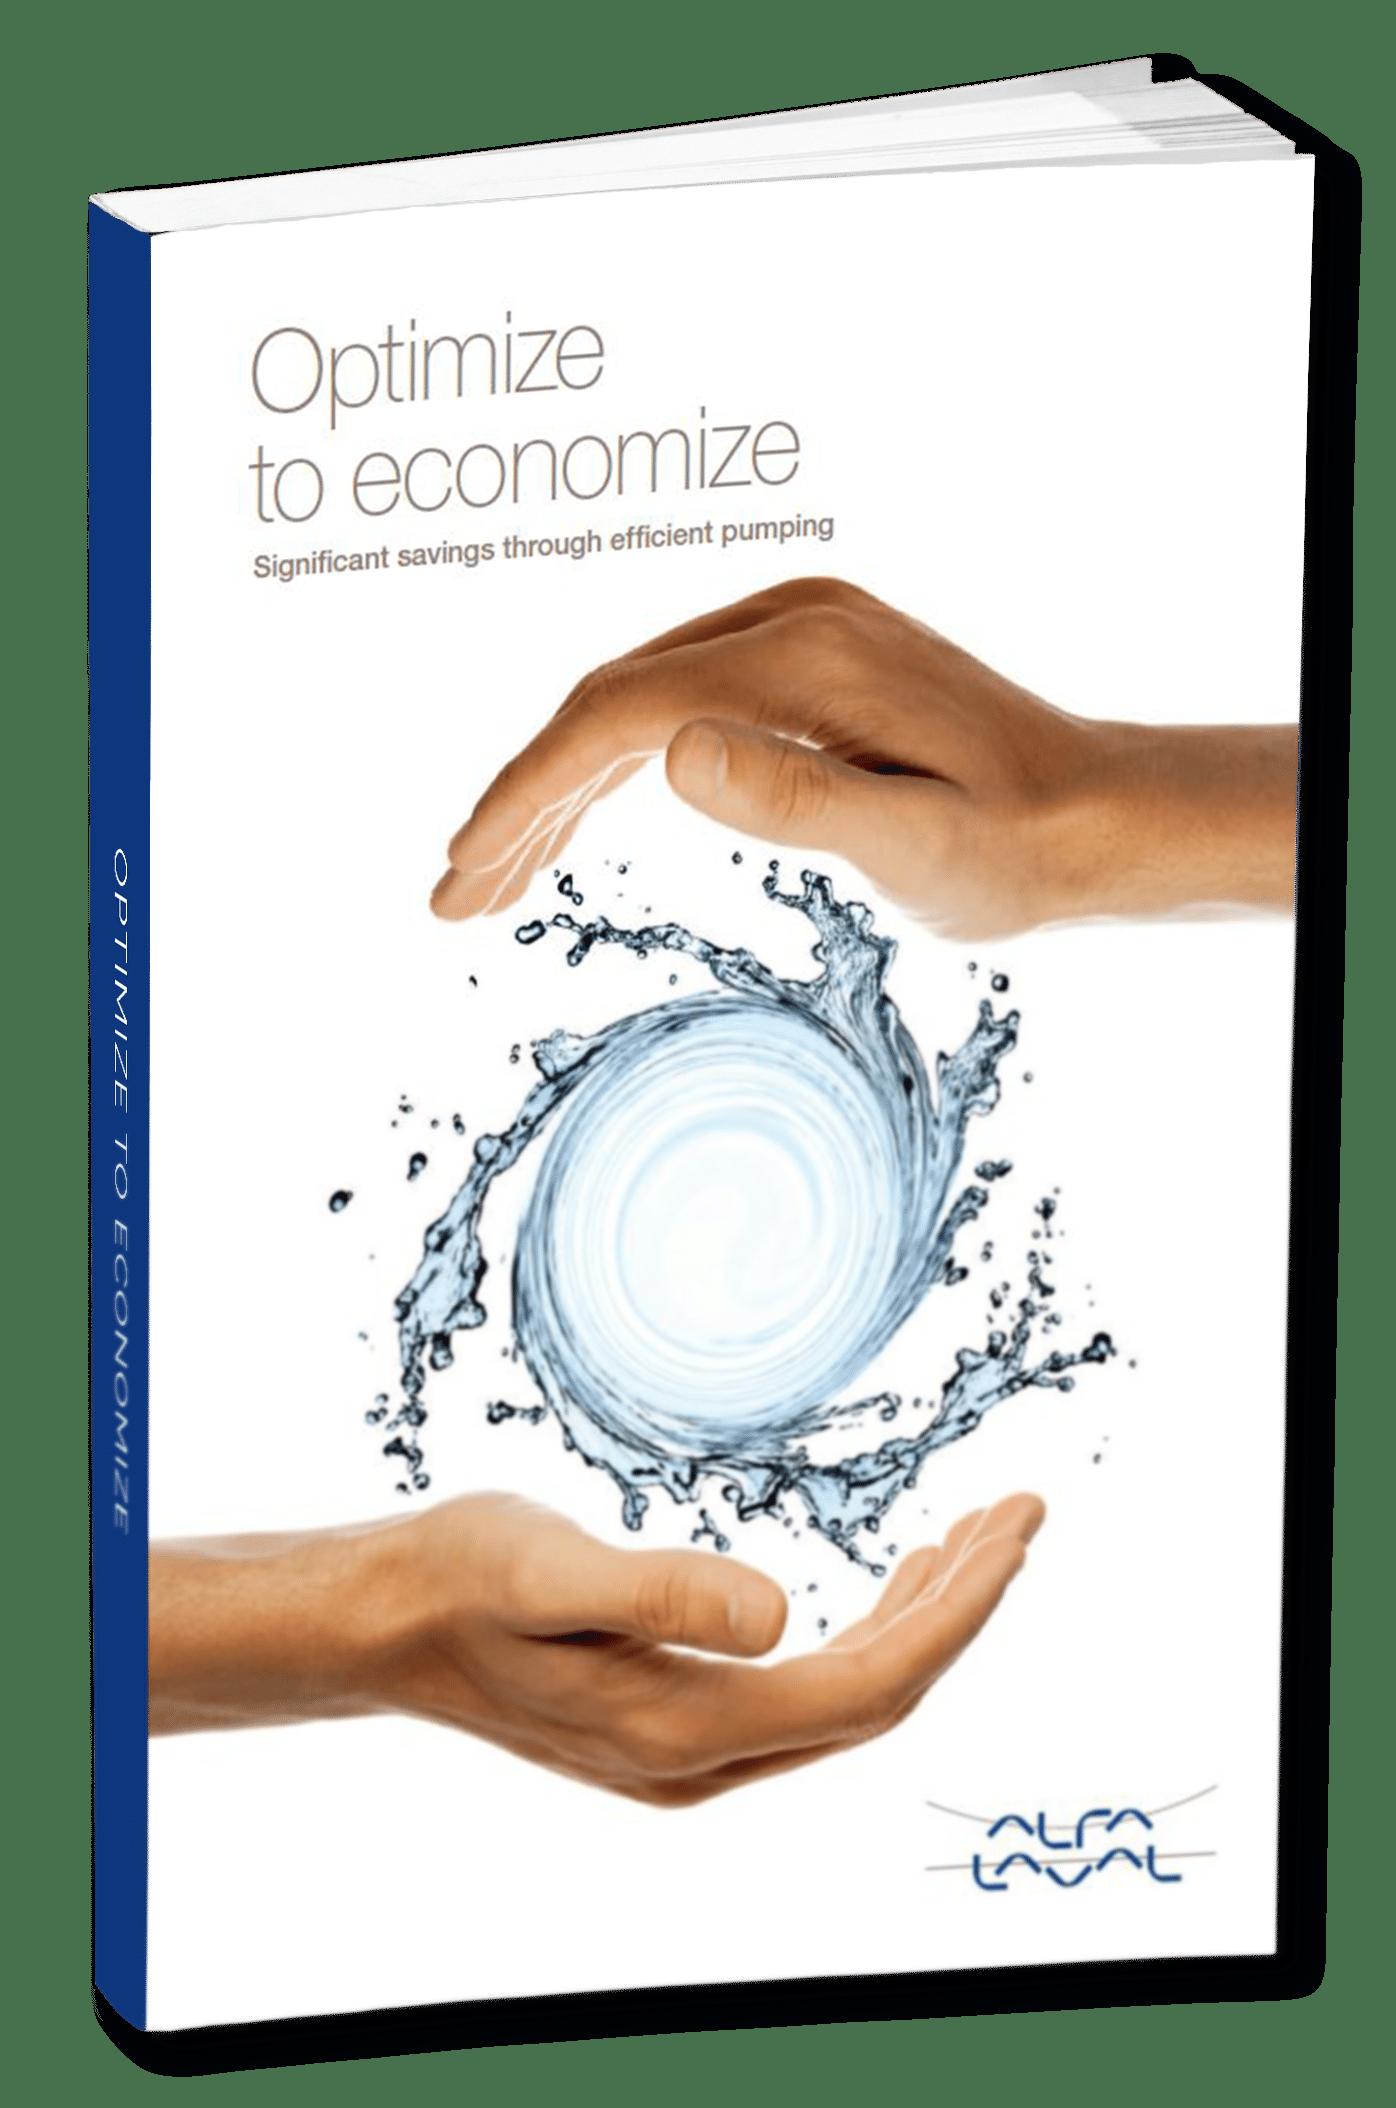 optimize to economize brochure